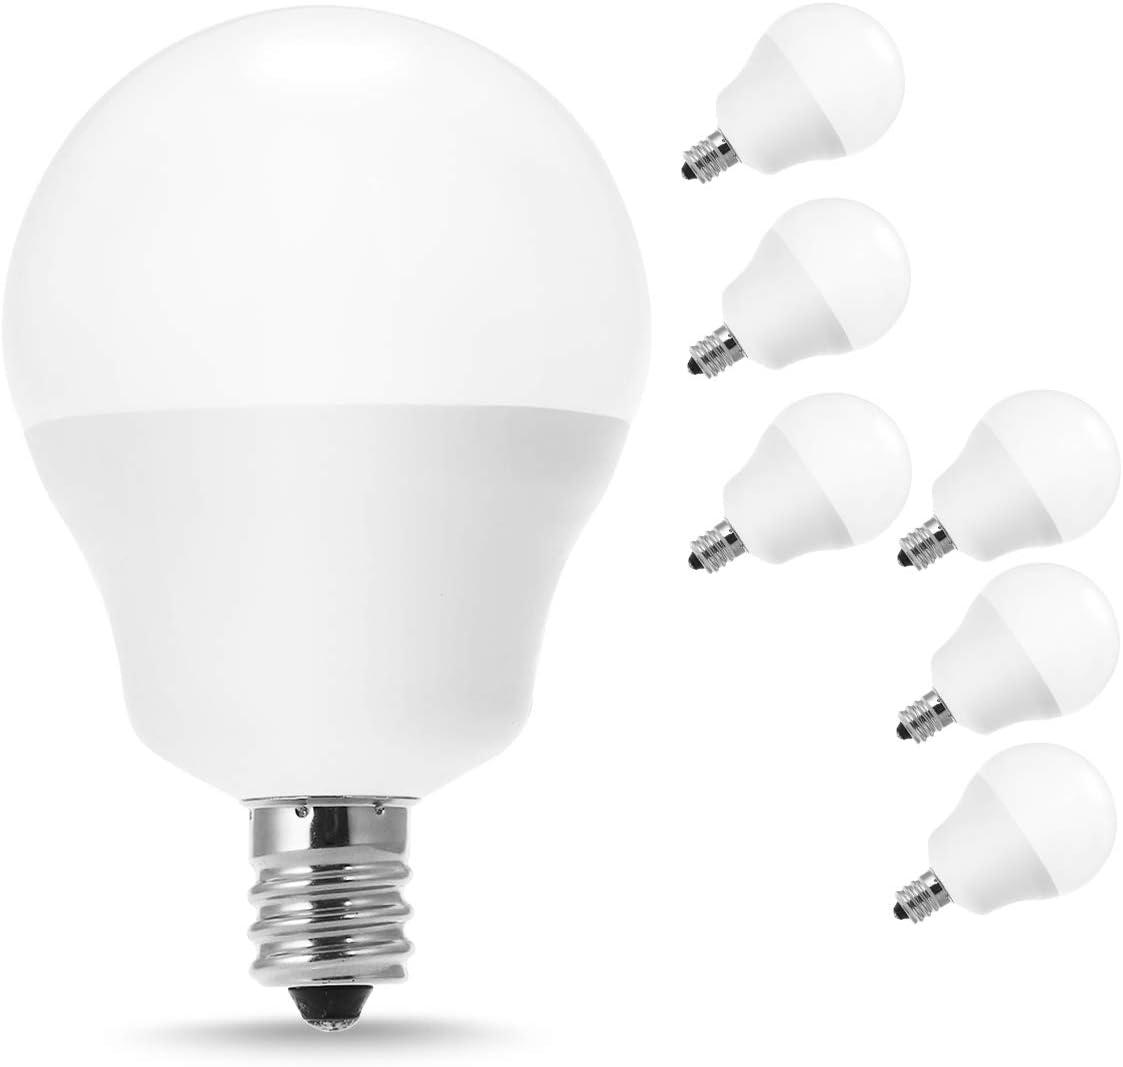 JandCase E12 Candelabra LED Bulb, 40W Equivalent G14 LED Bulbs, Soft White 3000K, 5W Ceiling Fan Light, 450lm, Vanity Mirror Lighting for Bathroom, Living Room, Bedroom, Not Dimmable, Pack of 6